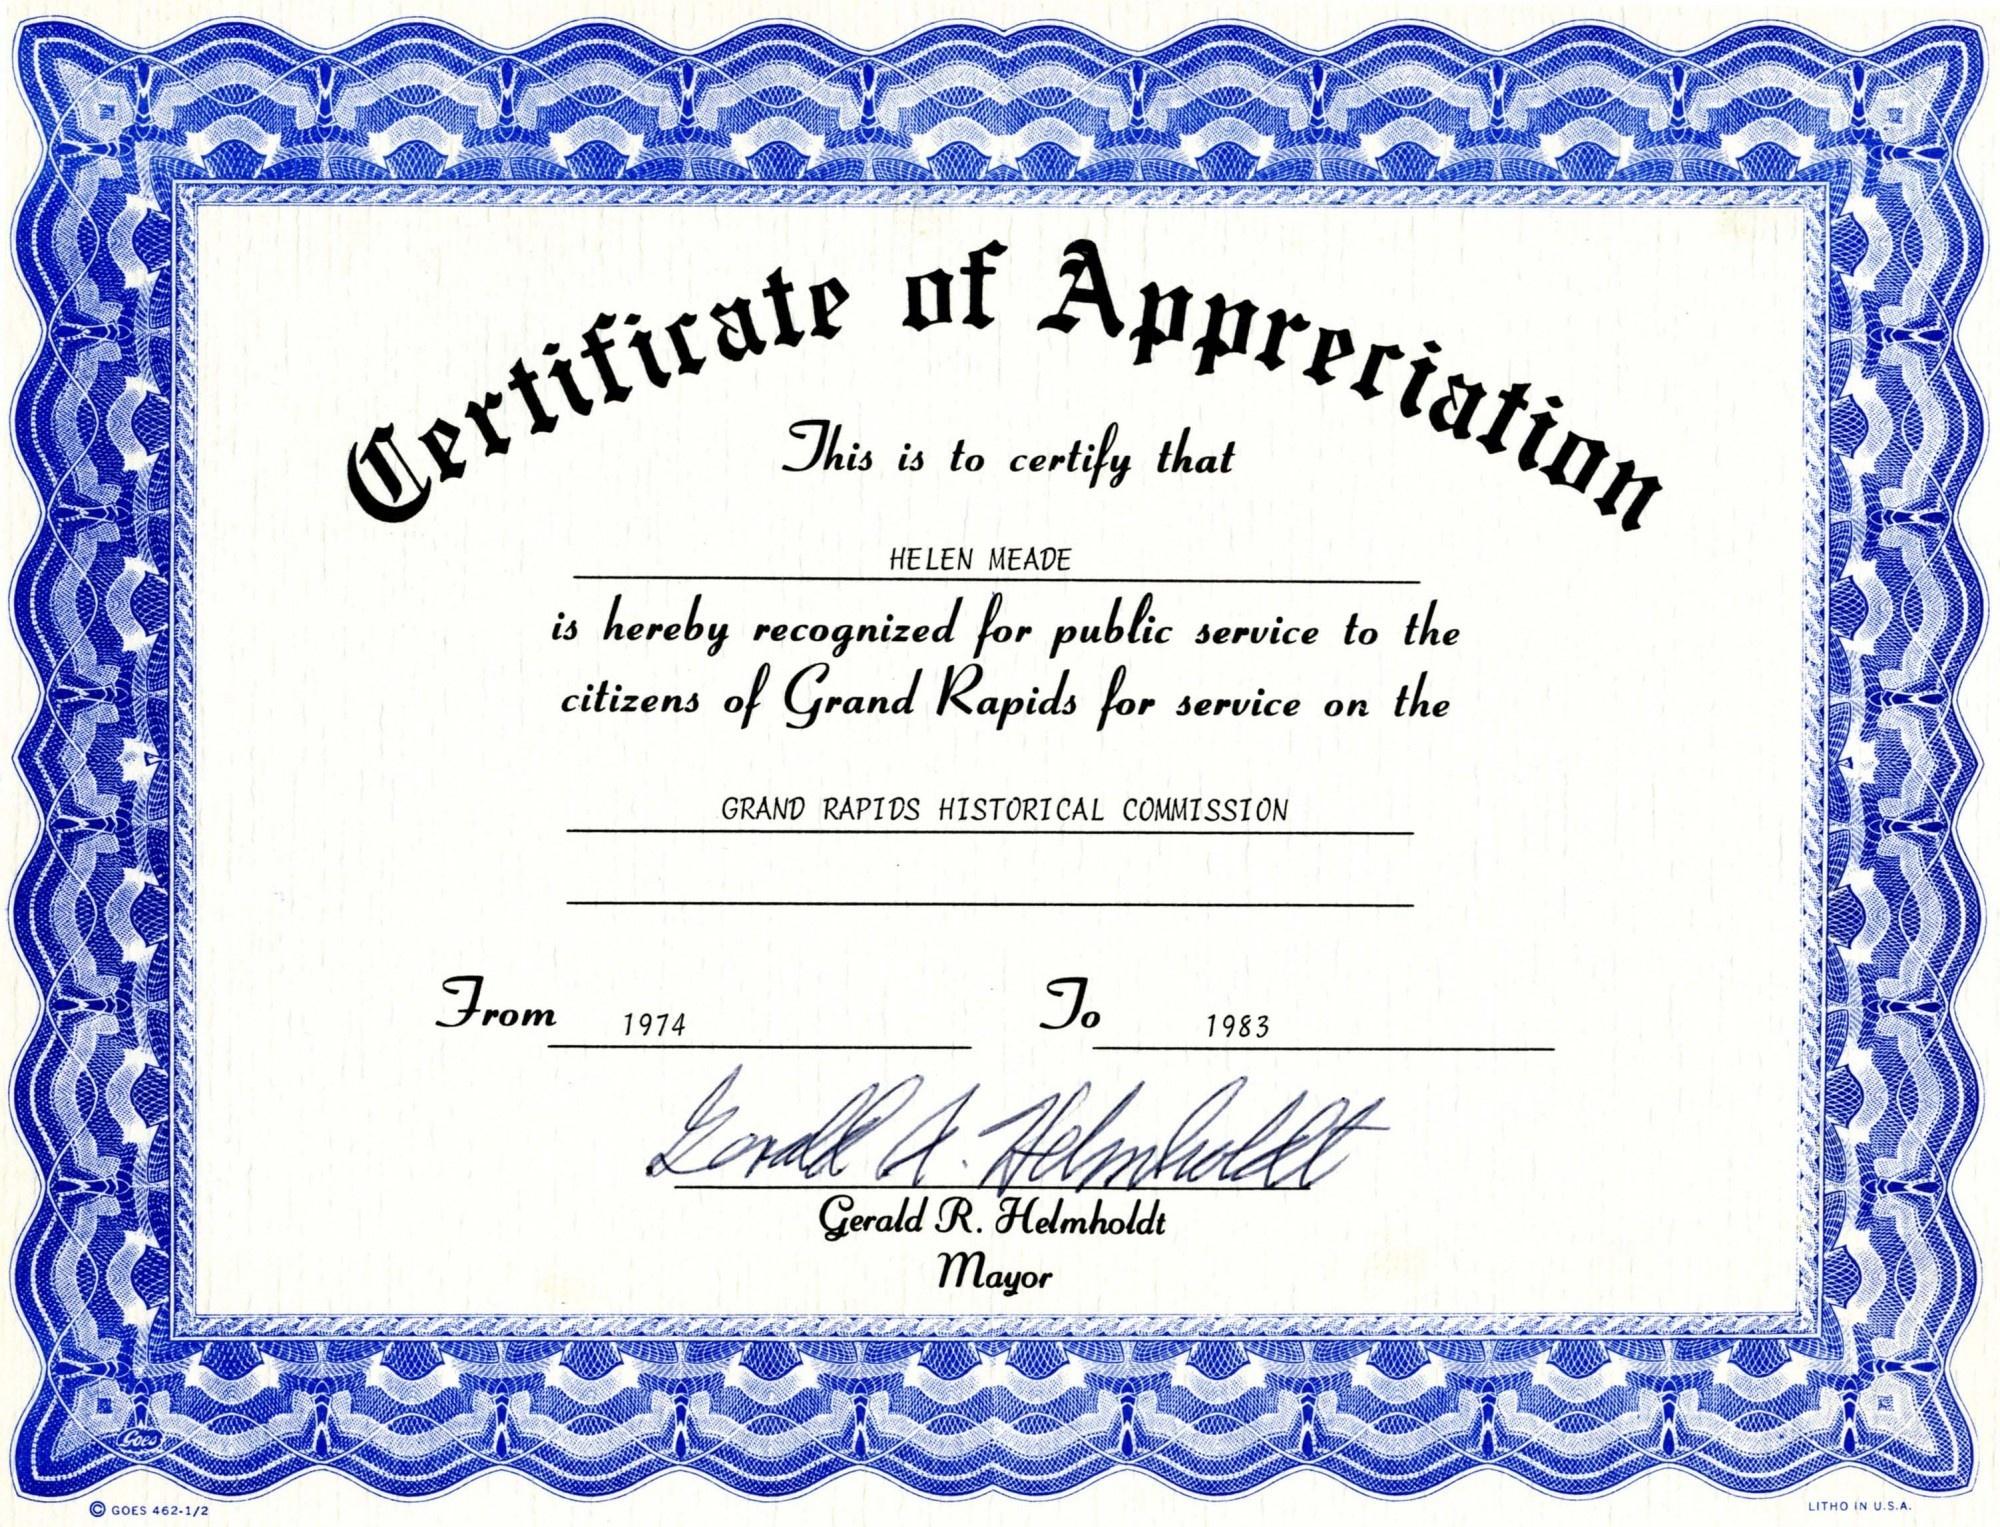 Appreciation Certificate Templates Free Download - Free Printable Templates For Certificates Of Recognition